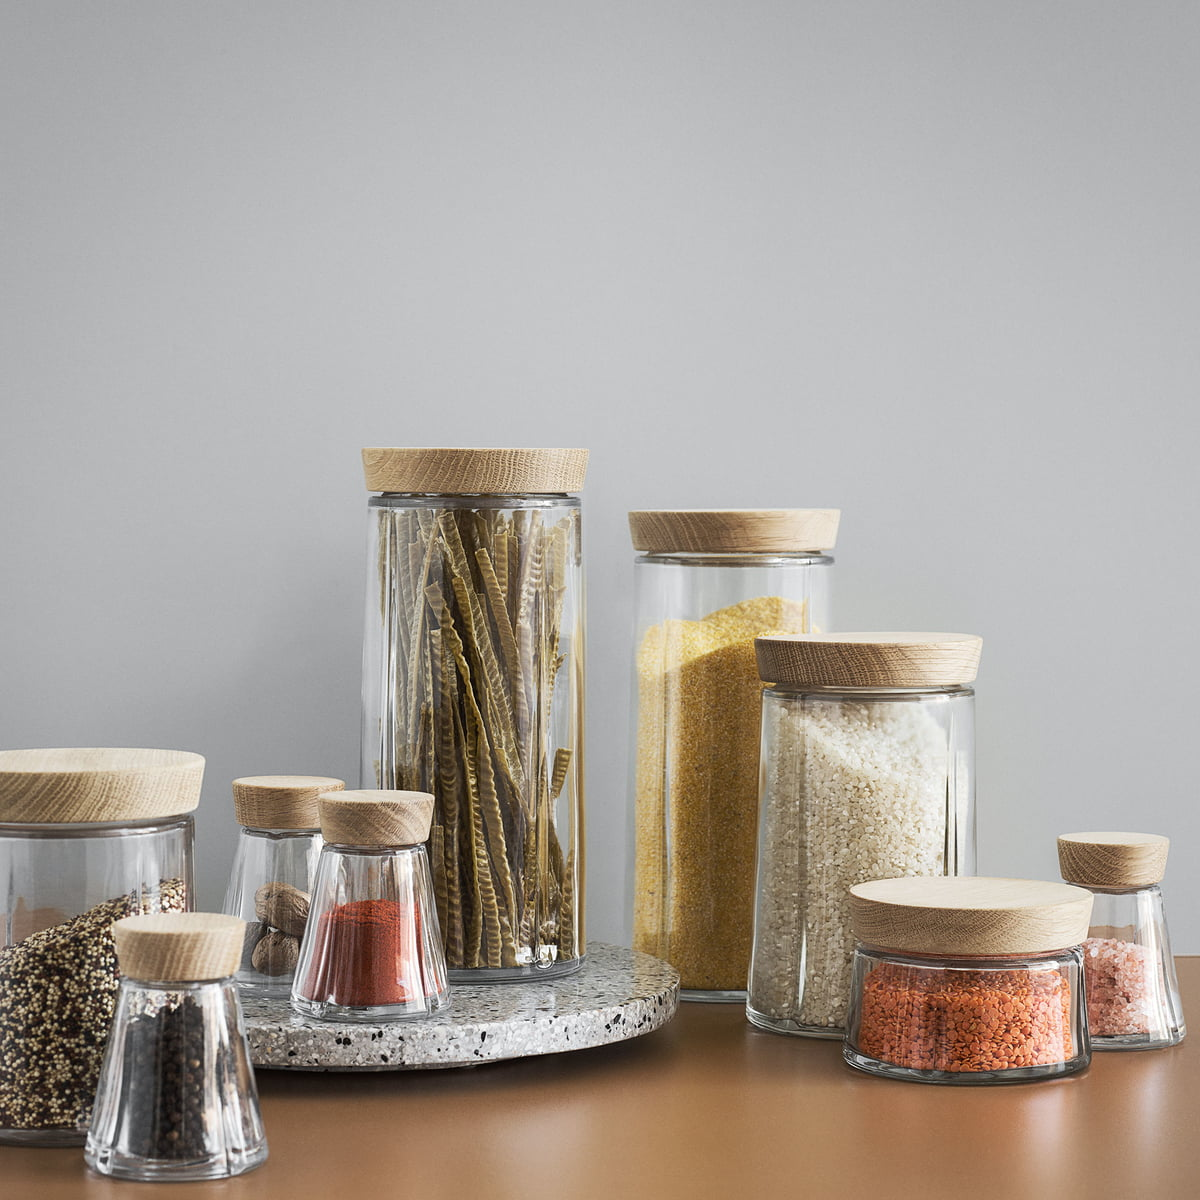 Grand Cru Storage Jars By Rosendahl In Our Shop